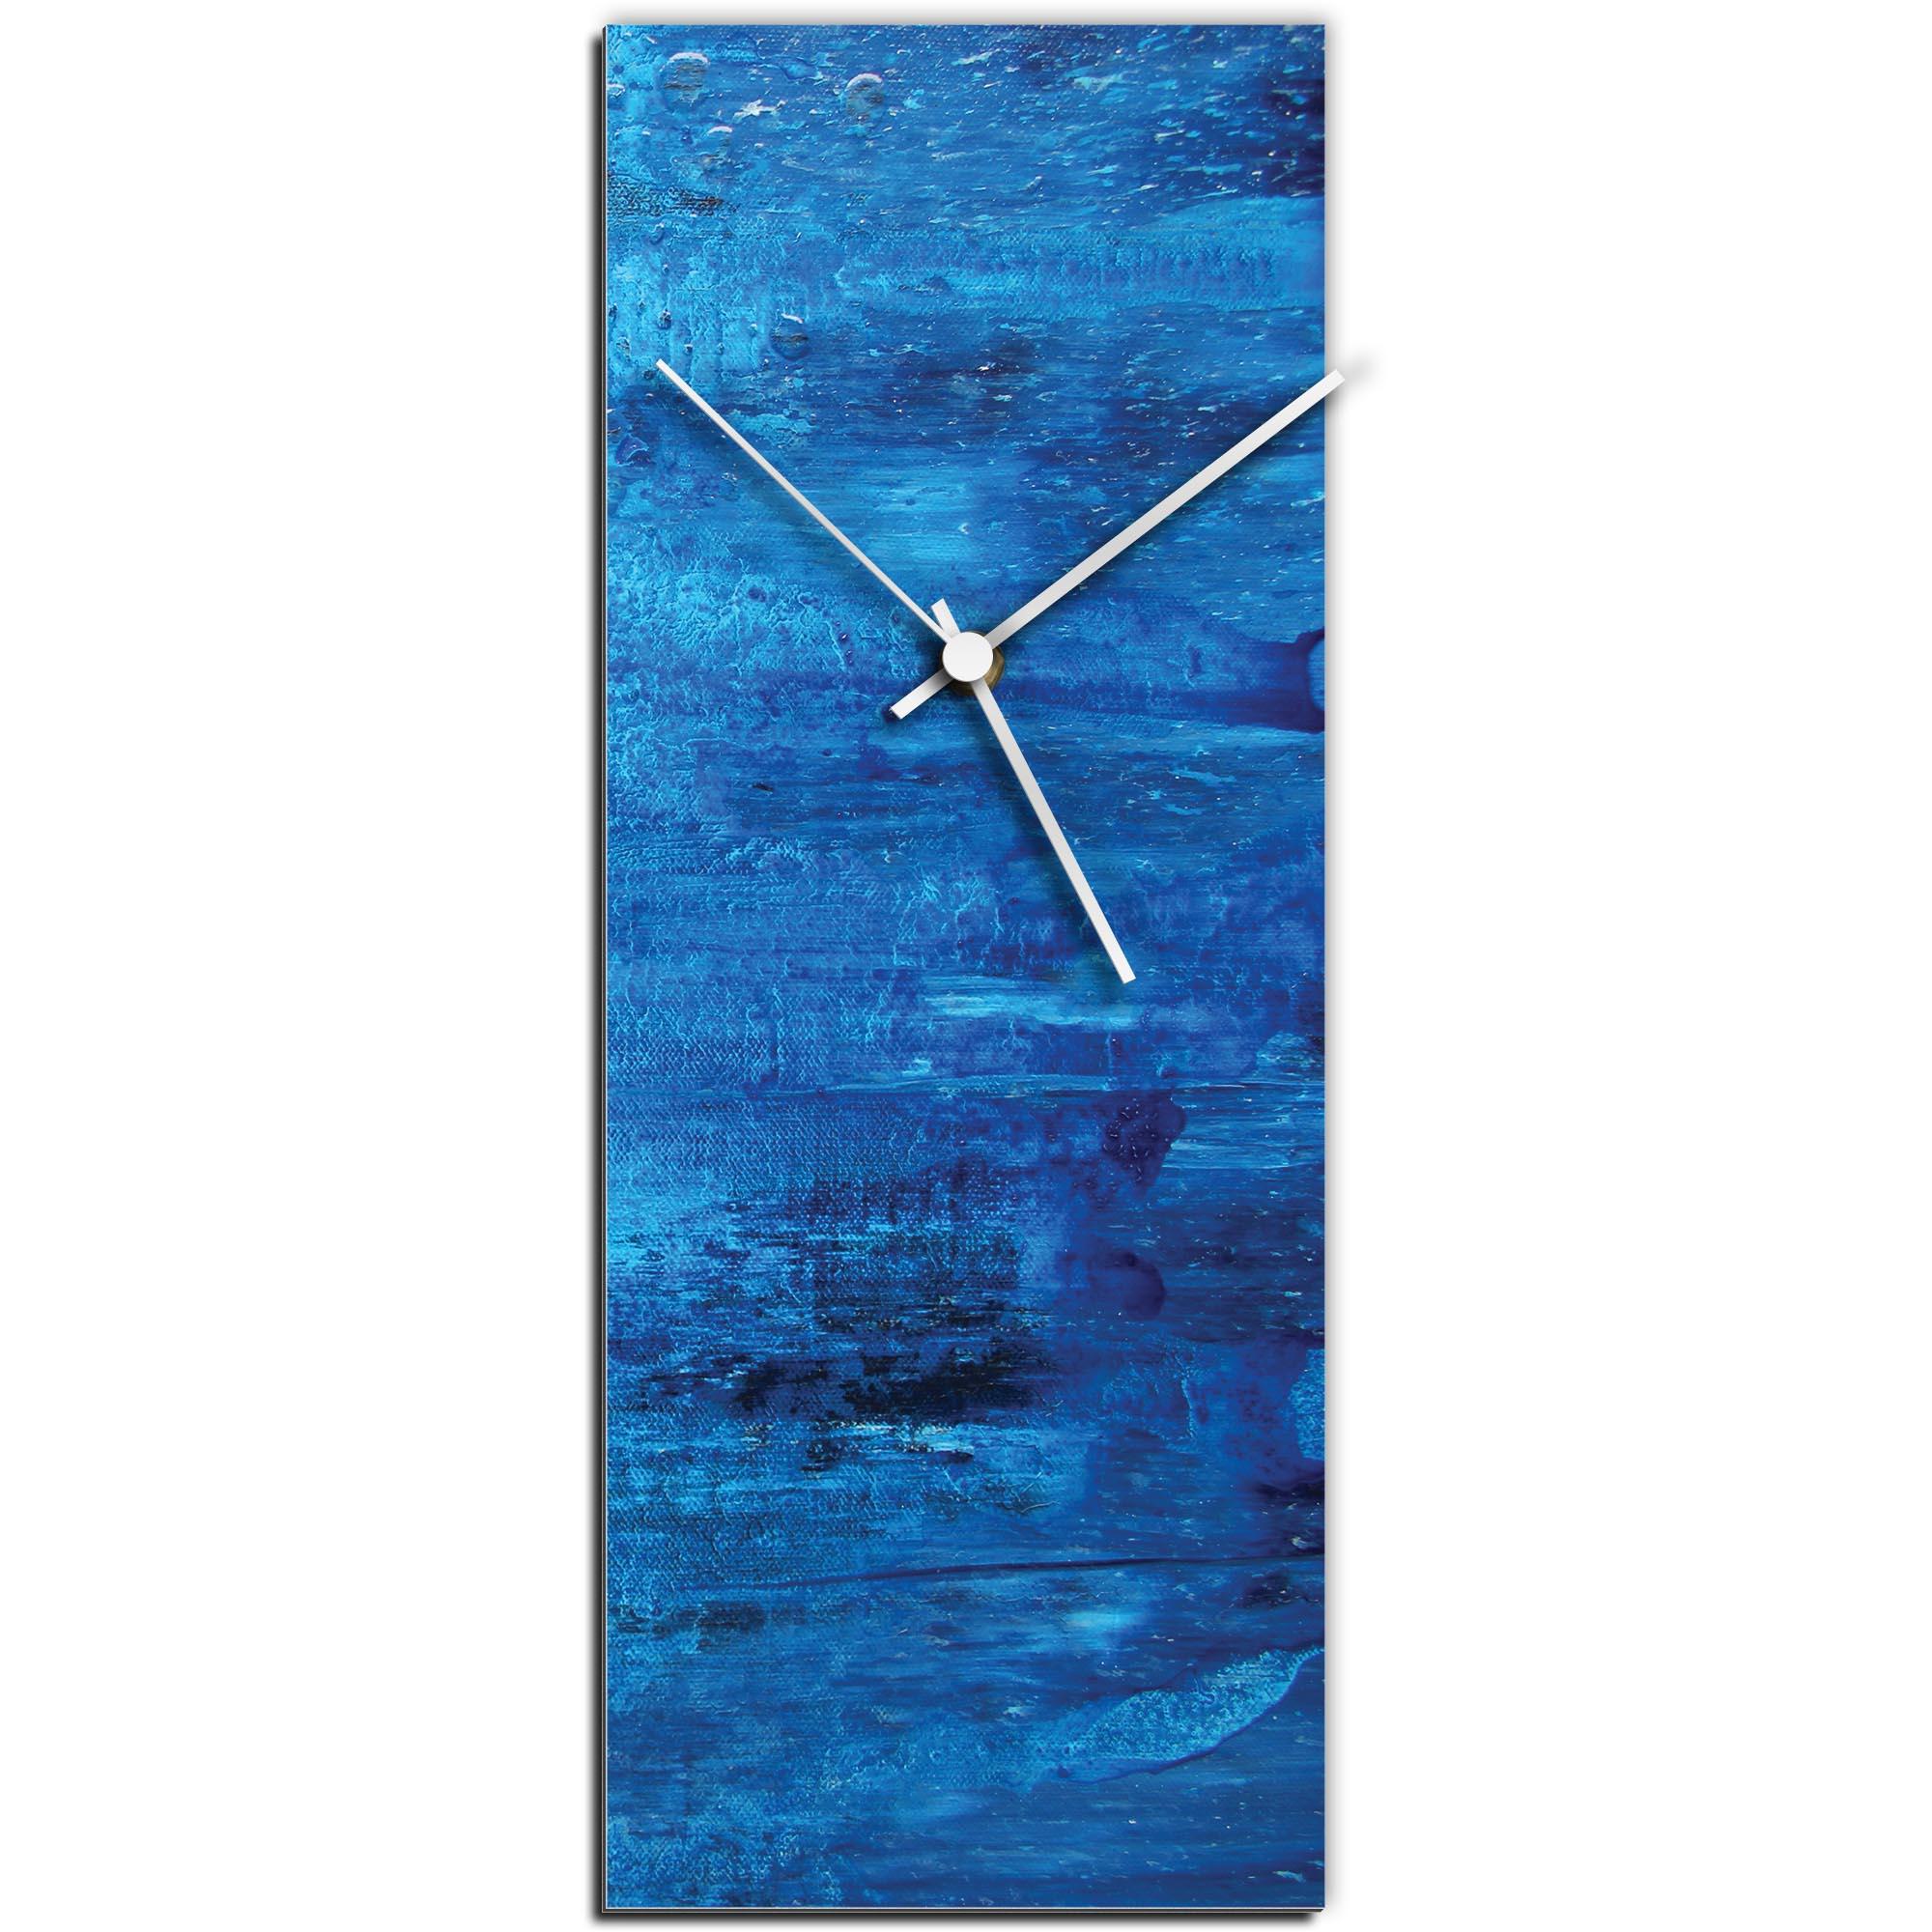 Mendo Vasilevski 'City Blue v2 Clock Large' 9in x 24in Modern Wall Clock on Aluminum Composite